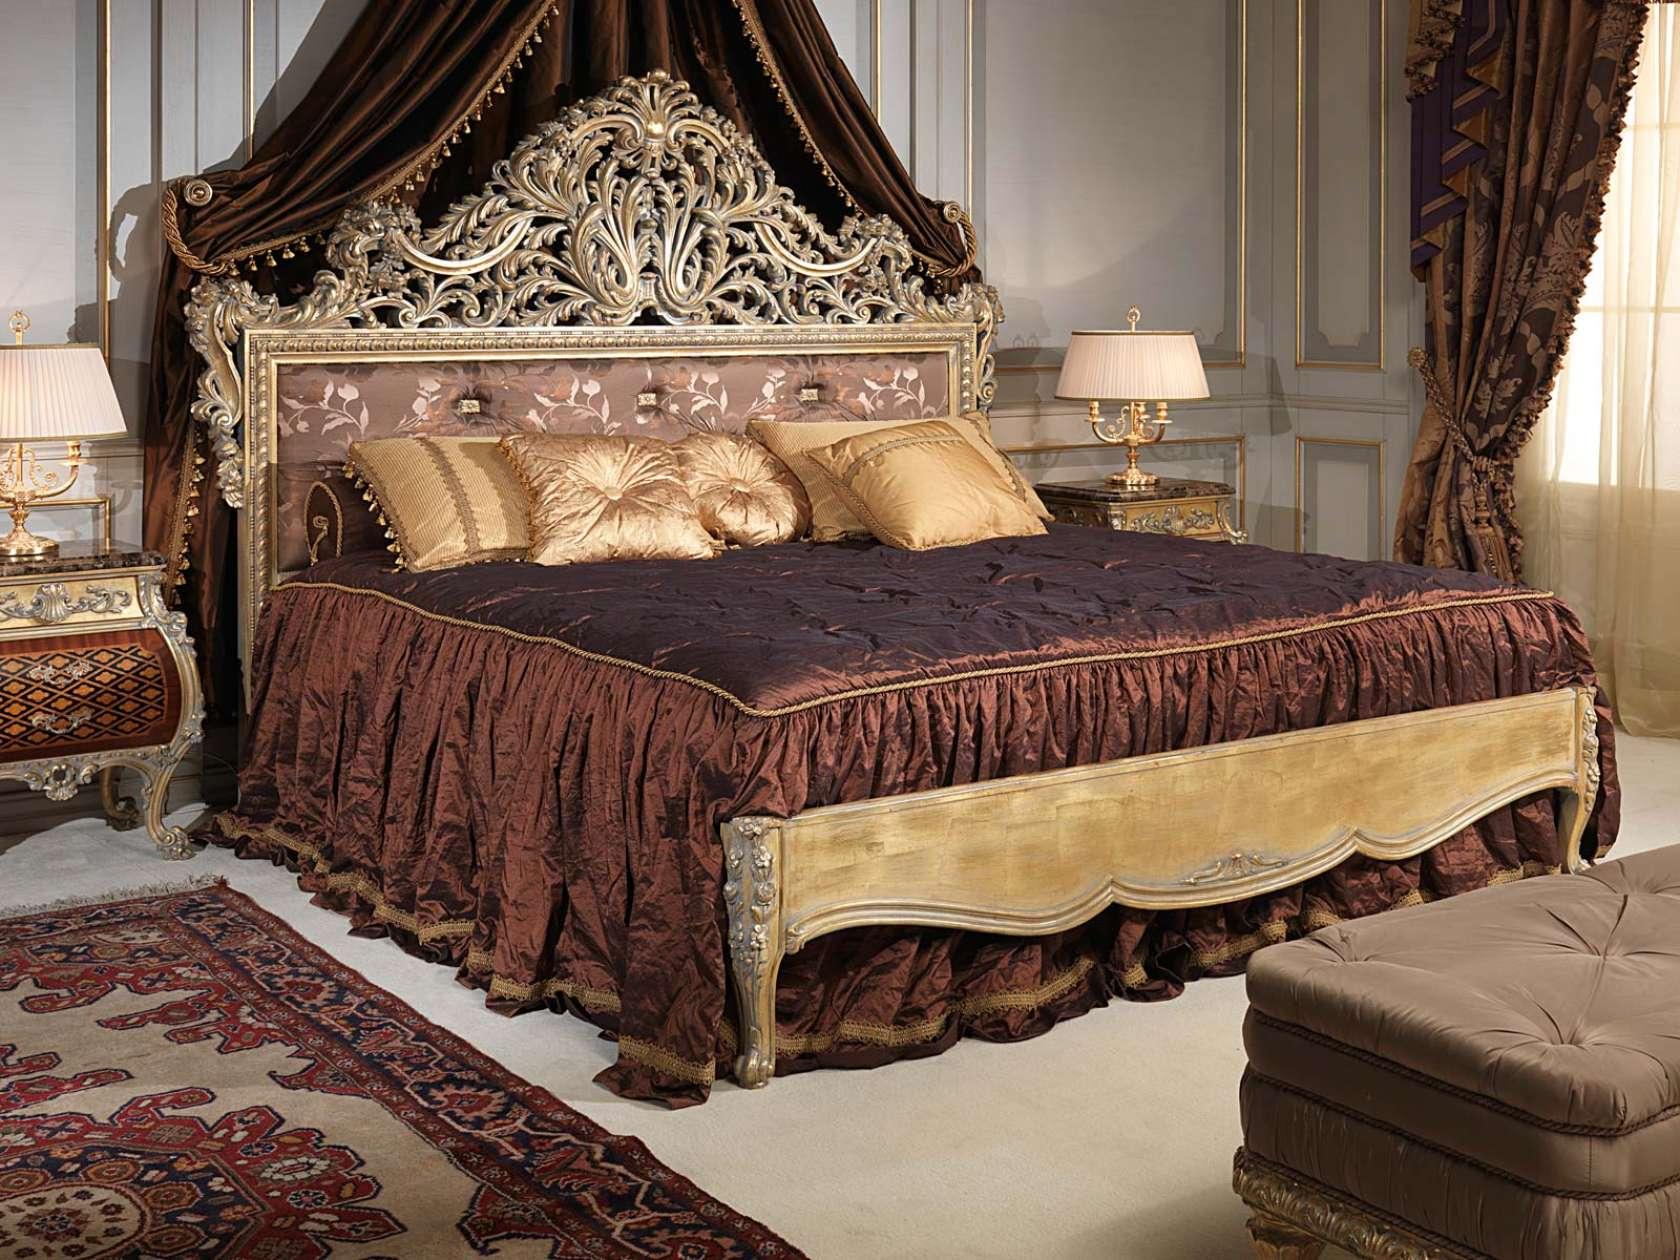 Chambre A Coucher De Luxe Cool Richbond Matelas Chambre Coucher Wda